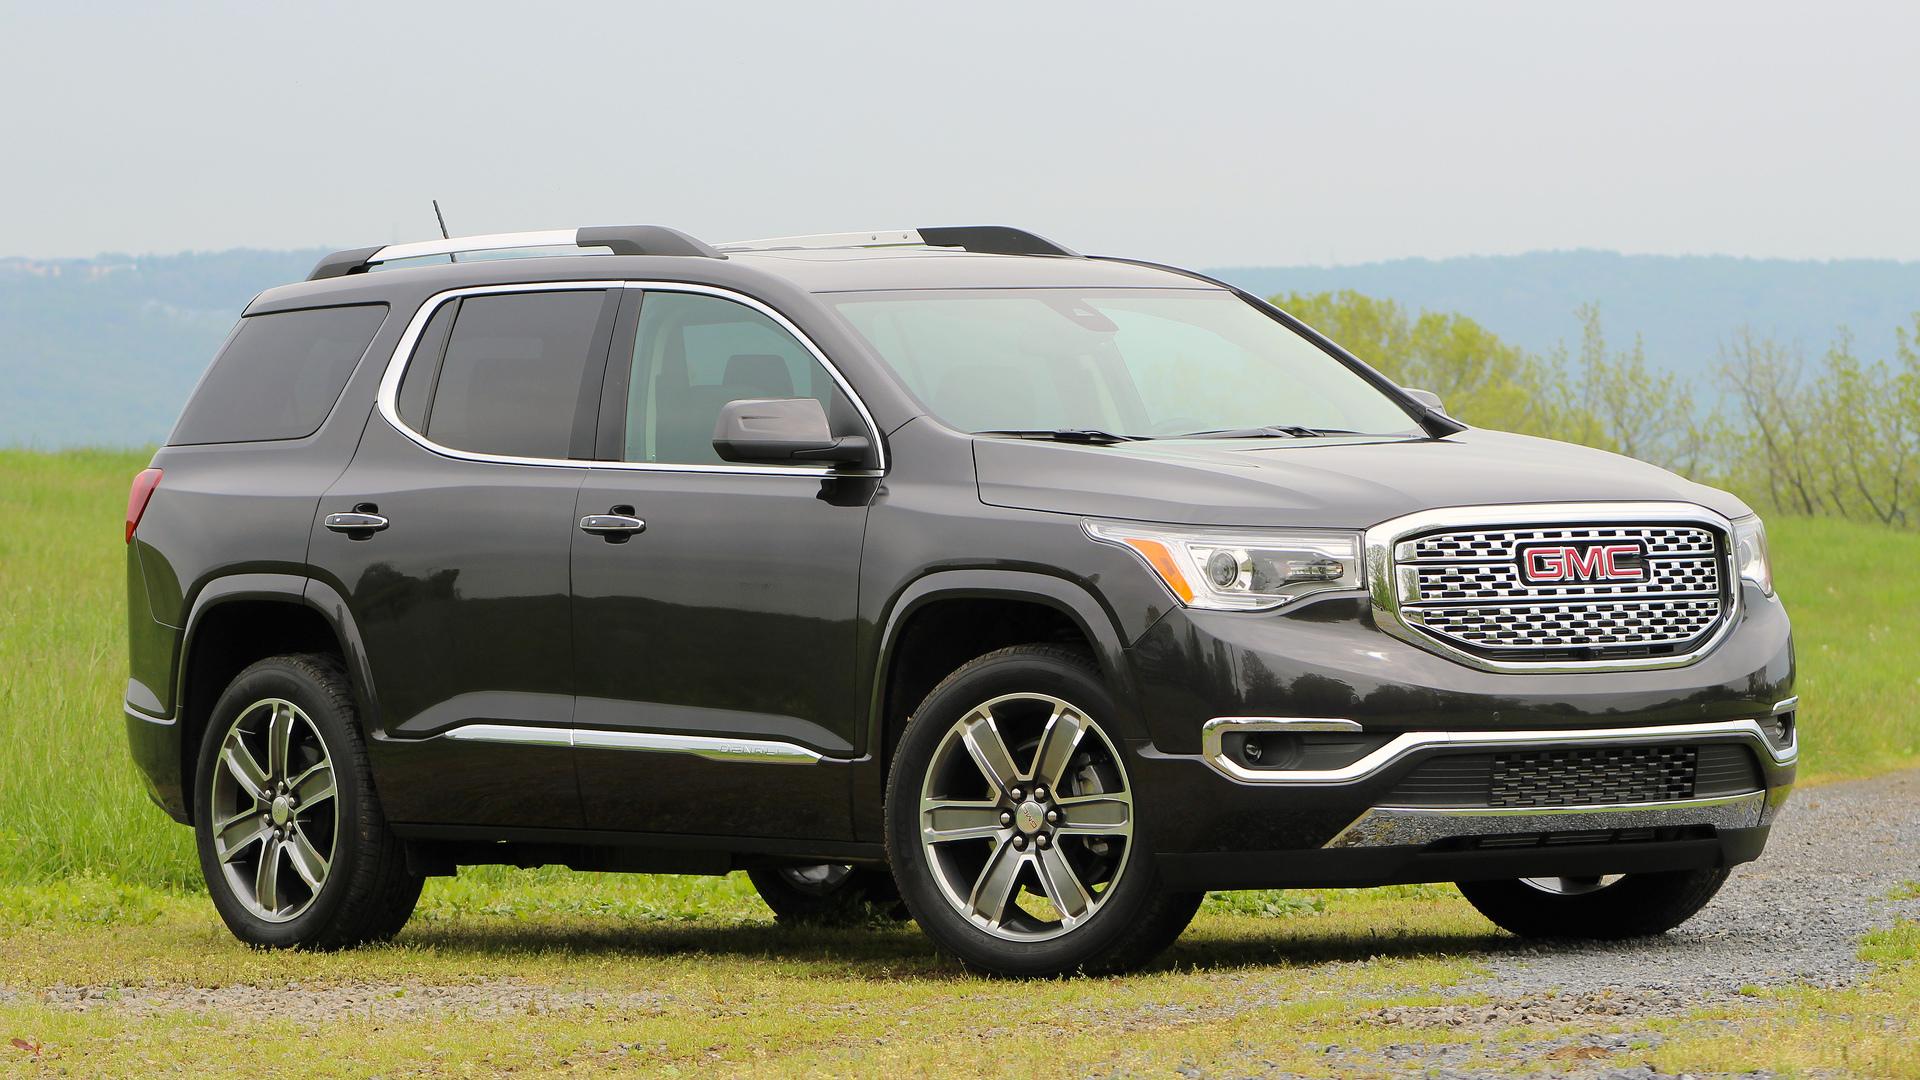 featured rebates acadia delphos buick gmc suv denali htm near vehicles new models lima